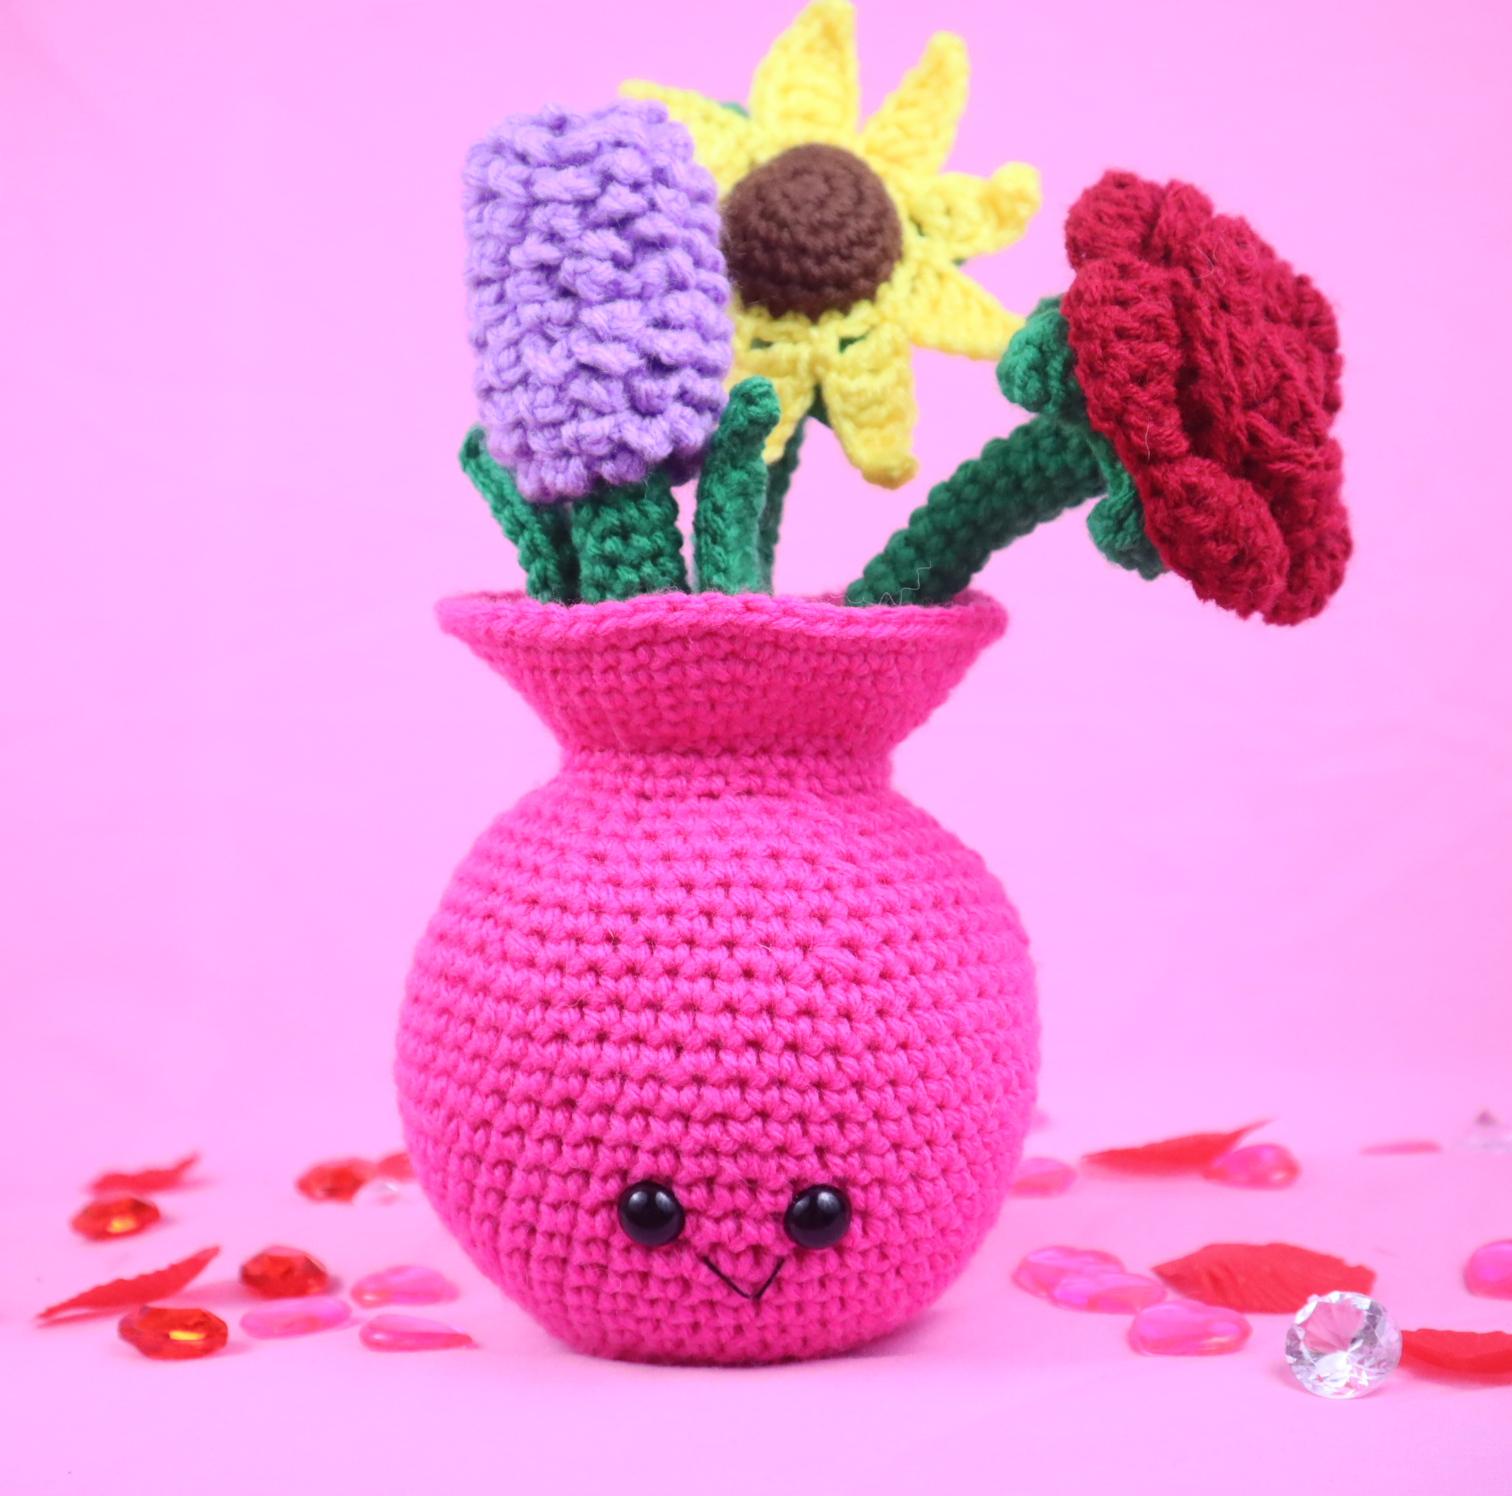 Amigurumi crochet pattern flowers in vase